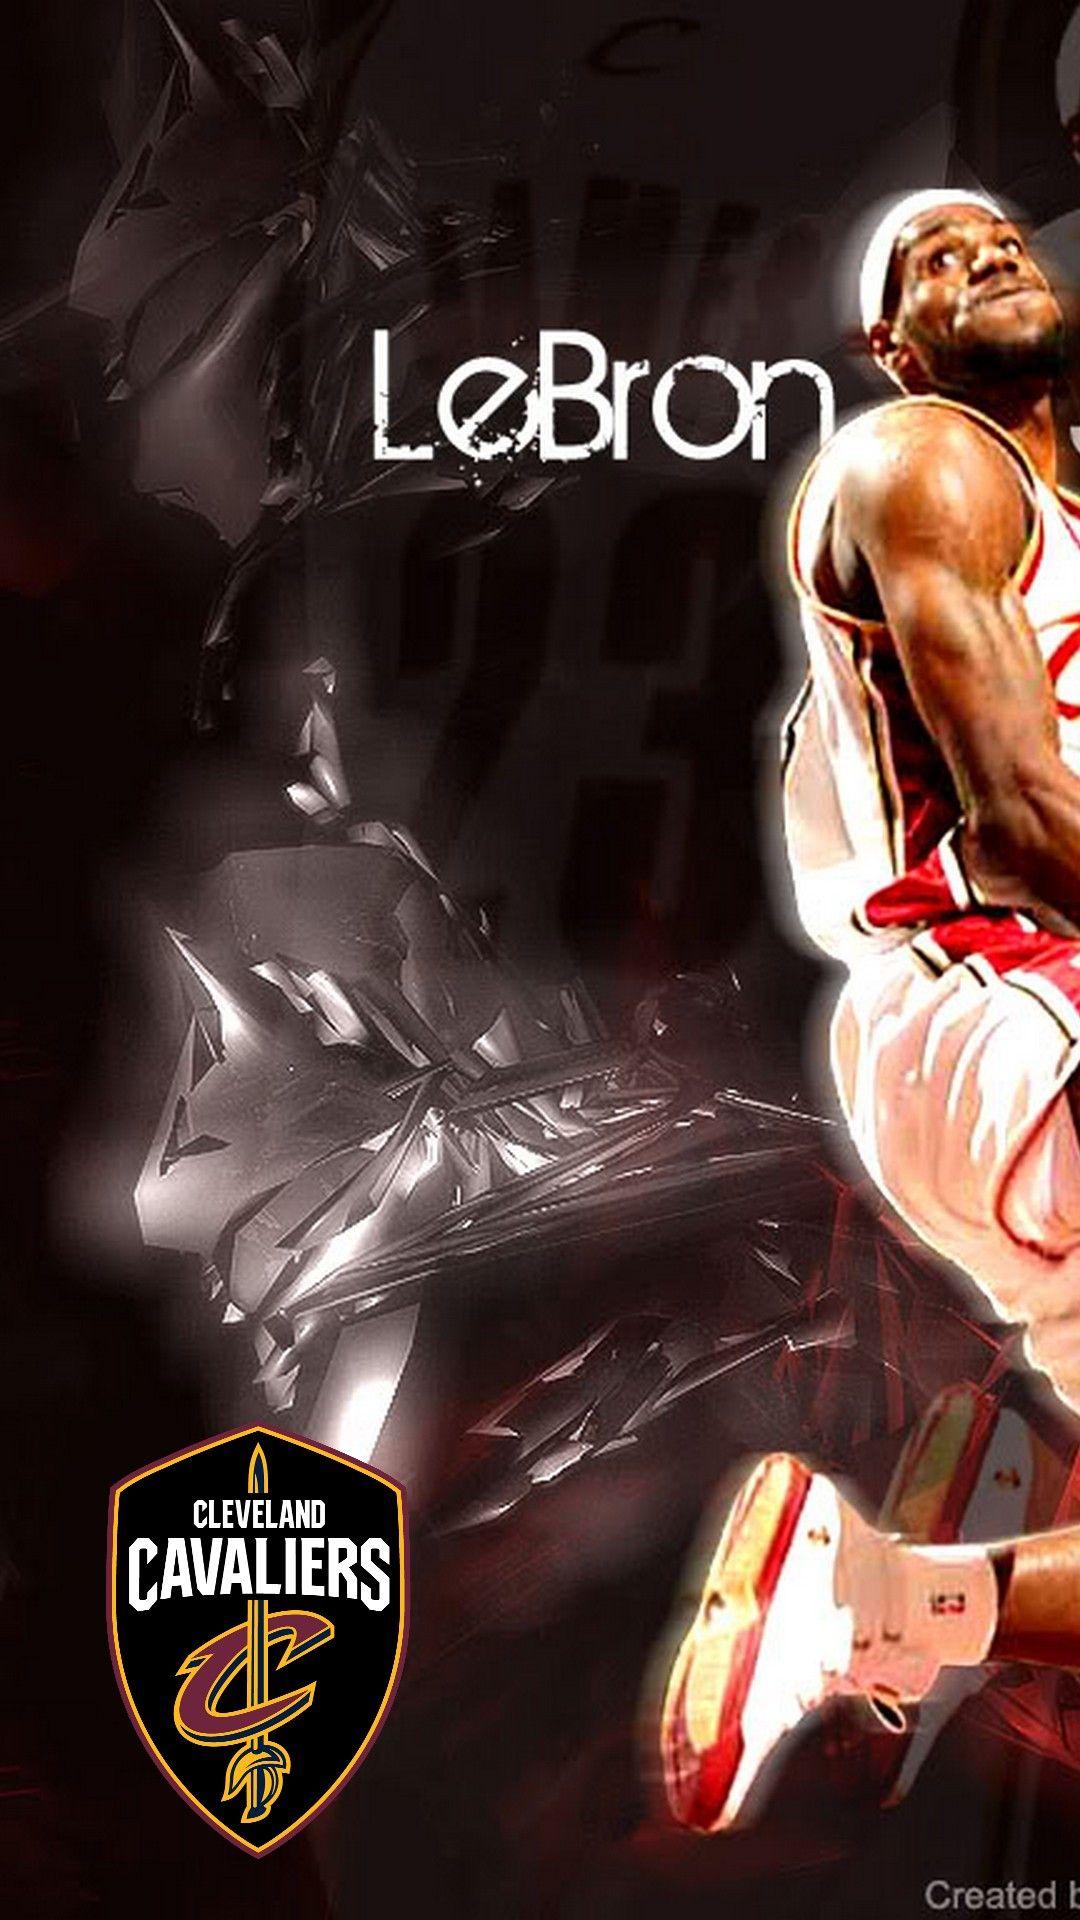 Cleveland Cavaliers Nba Iphone X Wallpaper 2021 Basketball Wallpaper Cavaliers Nba Cleveland Cavaliers Basketball Wallpaper